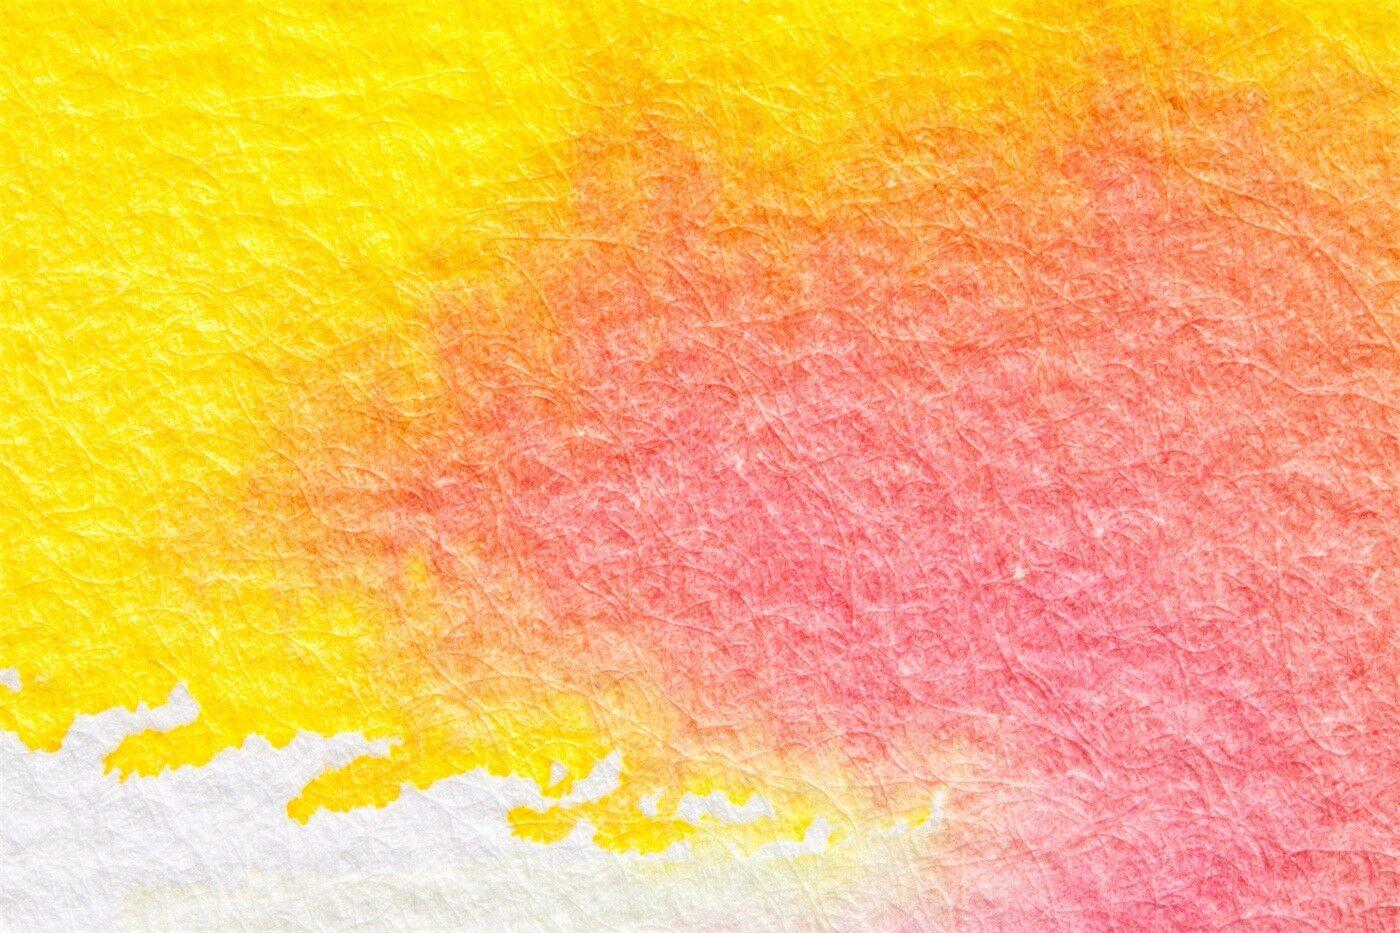 3D Textur Mädchen Gemalt 9733 9733 9733 Tapete Wandgemälde Tapeten Bild Familie DE Lemon   Discount    Primäre Qualität    Rabatt  826bf9